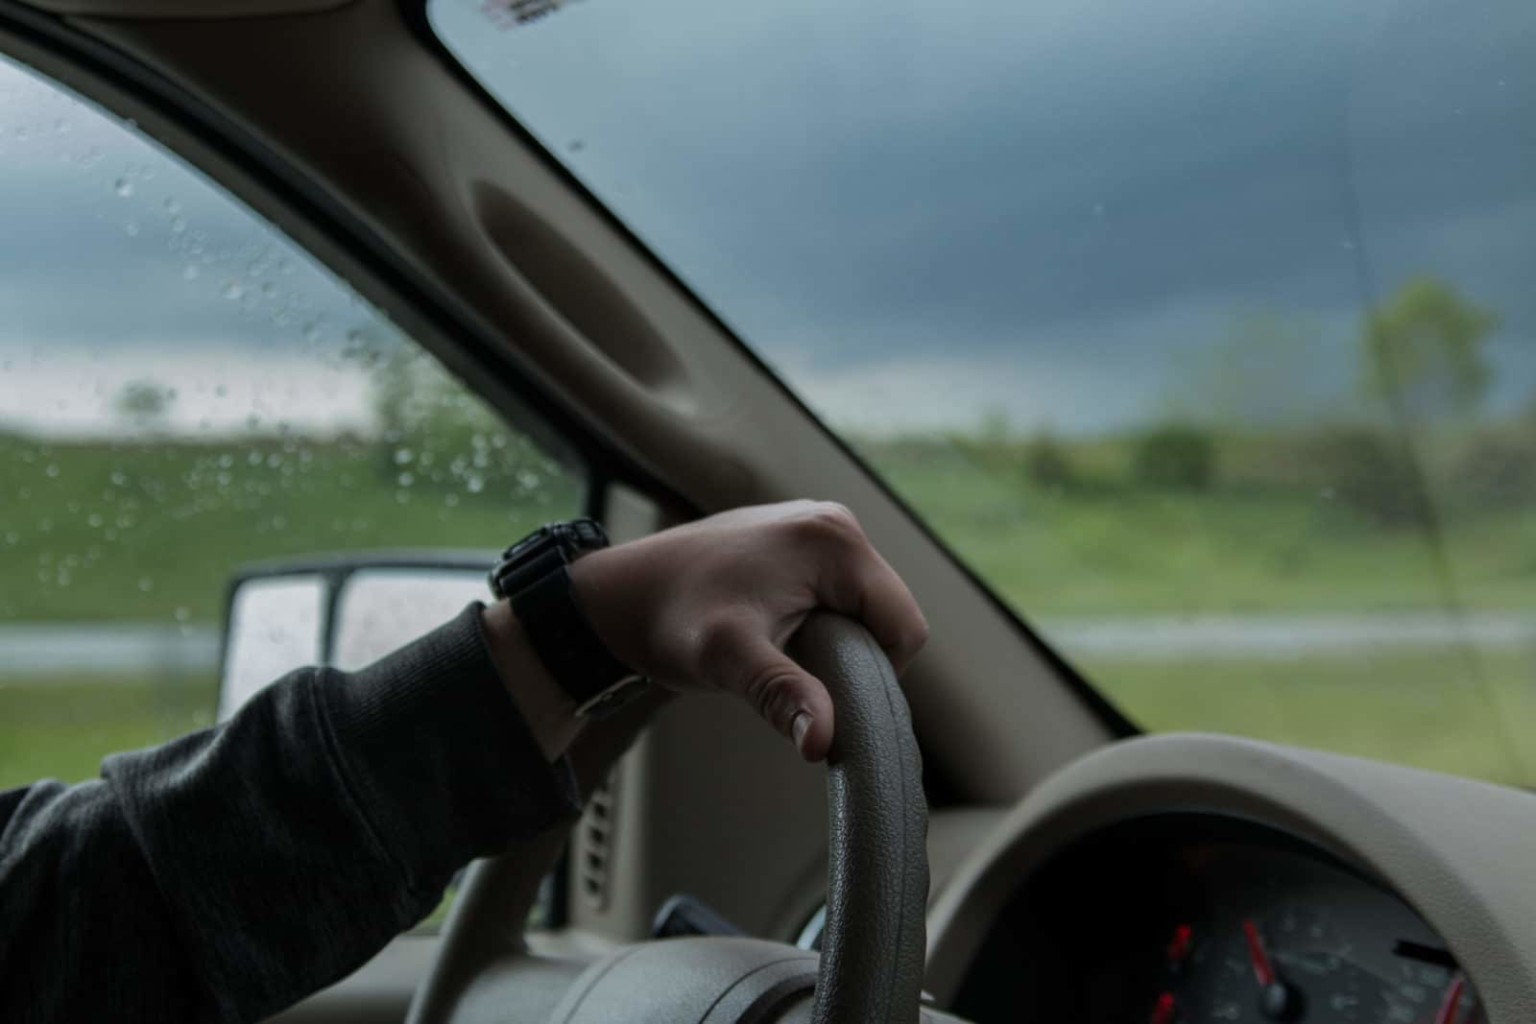 Verkehrsrecht/ EU-Fahrerlaubnis trotz Versagung inländischer Fahrerlaubnis